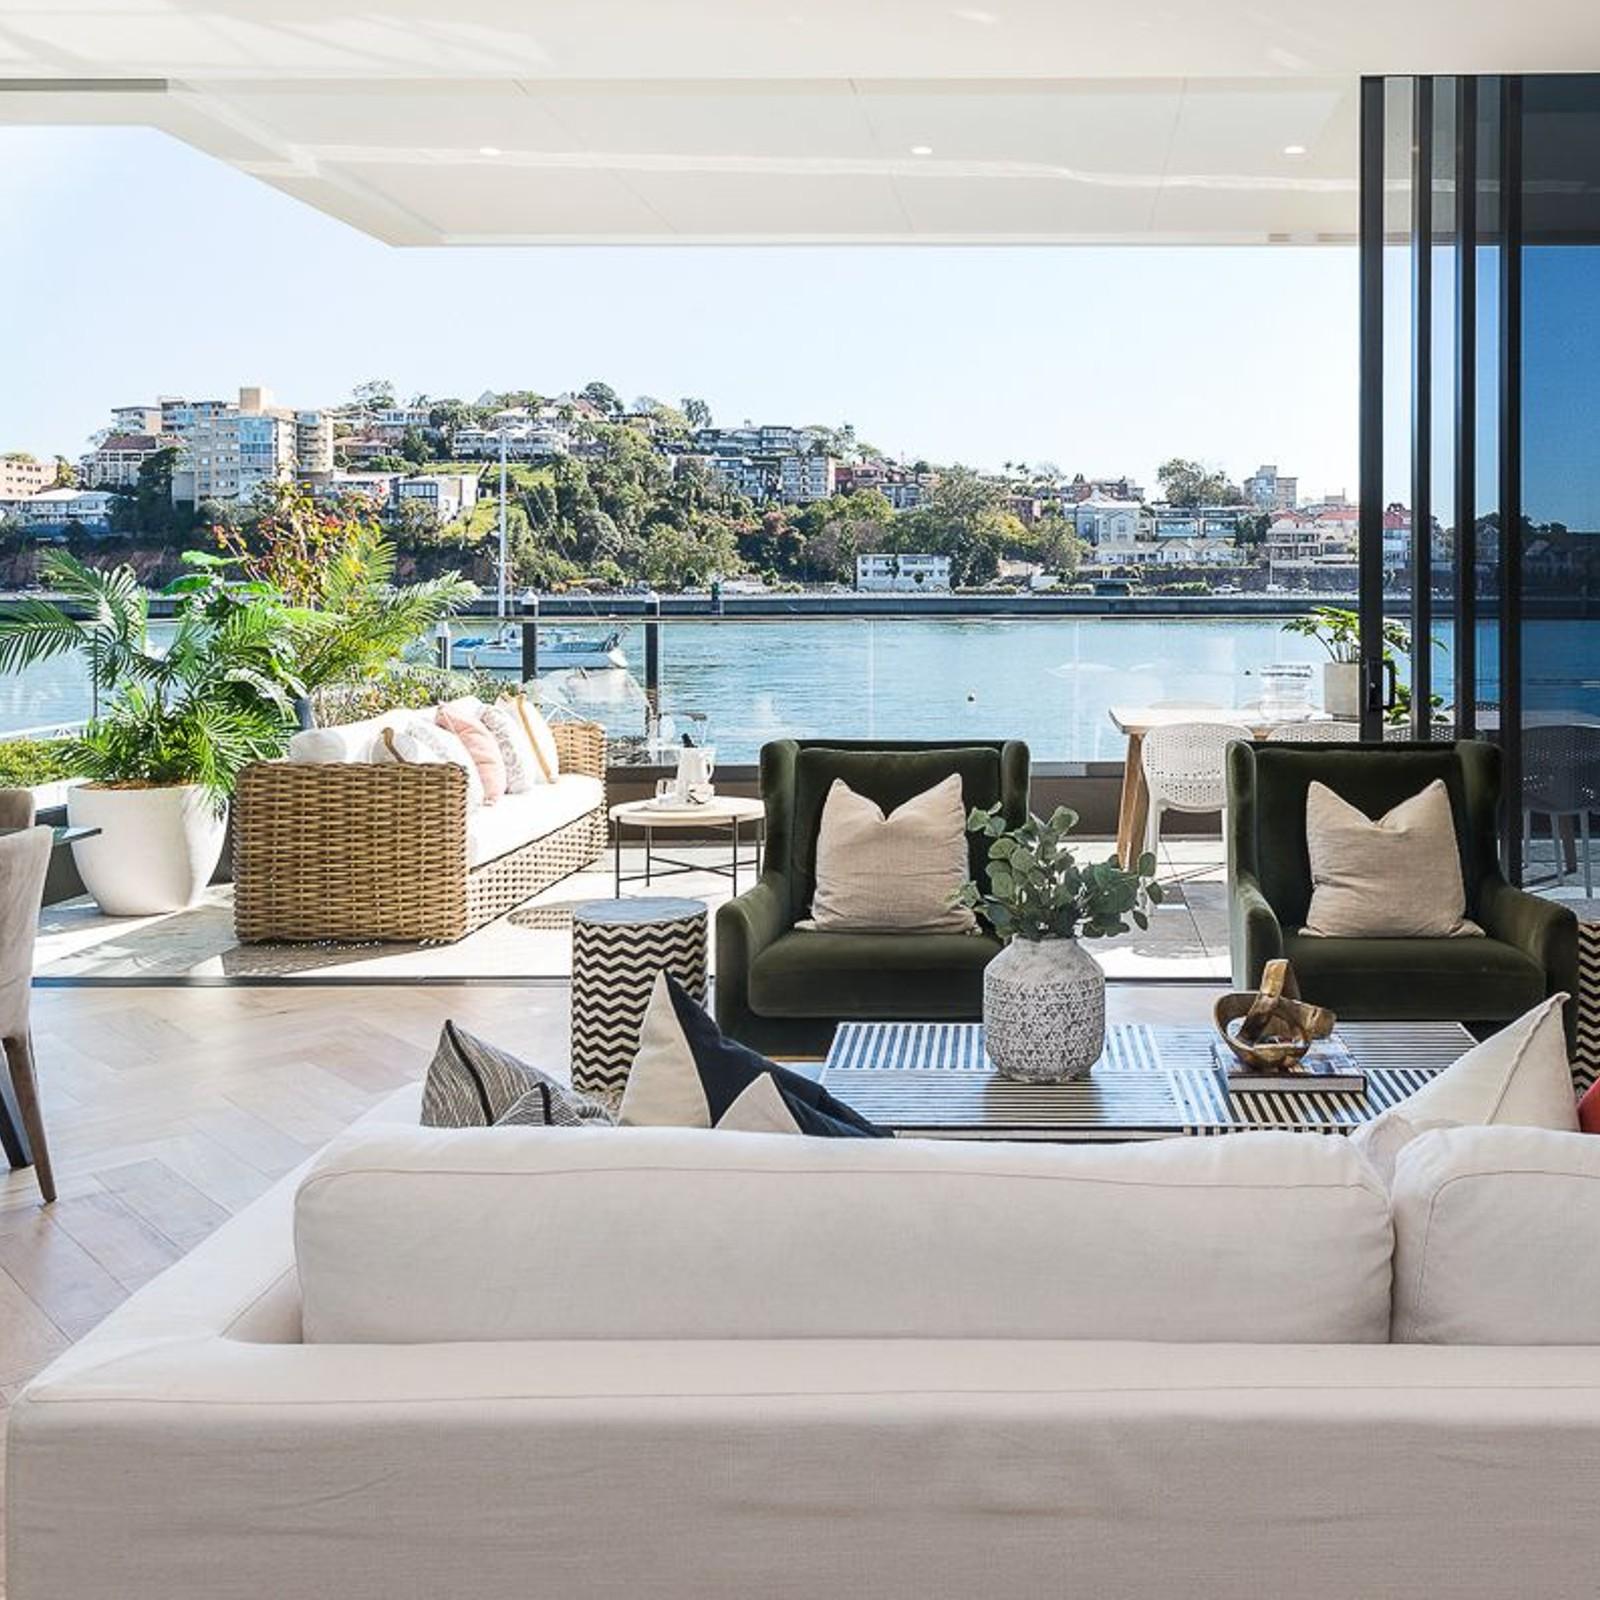 alba riverfront apartments